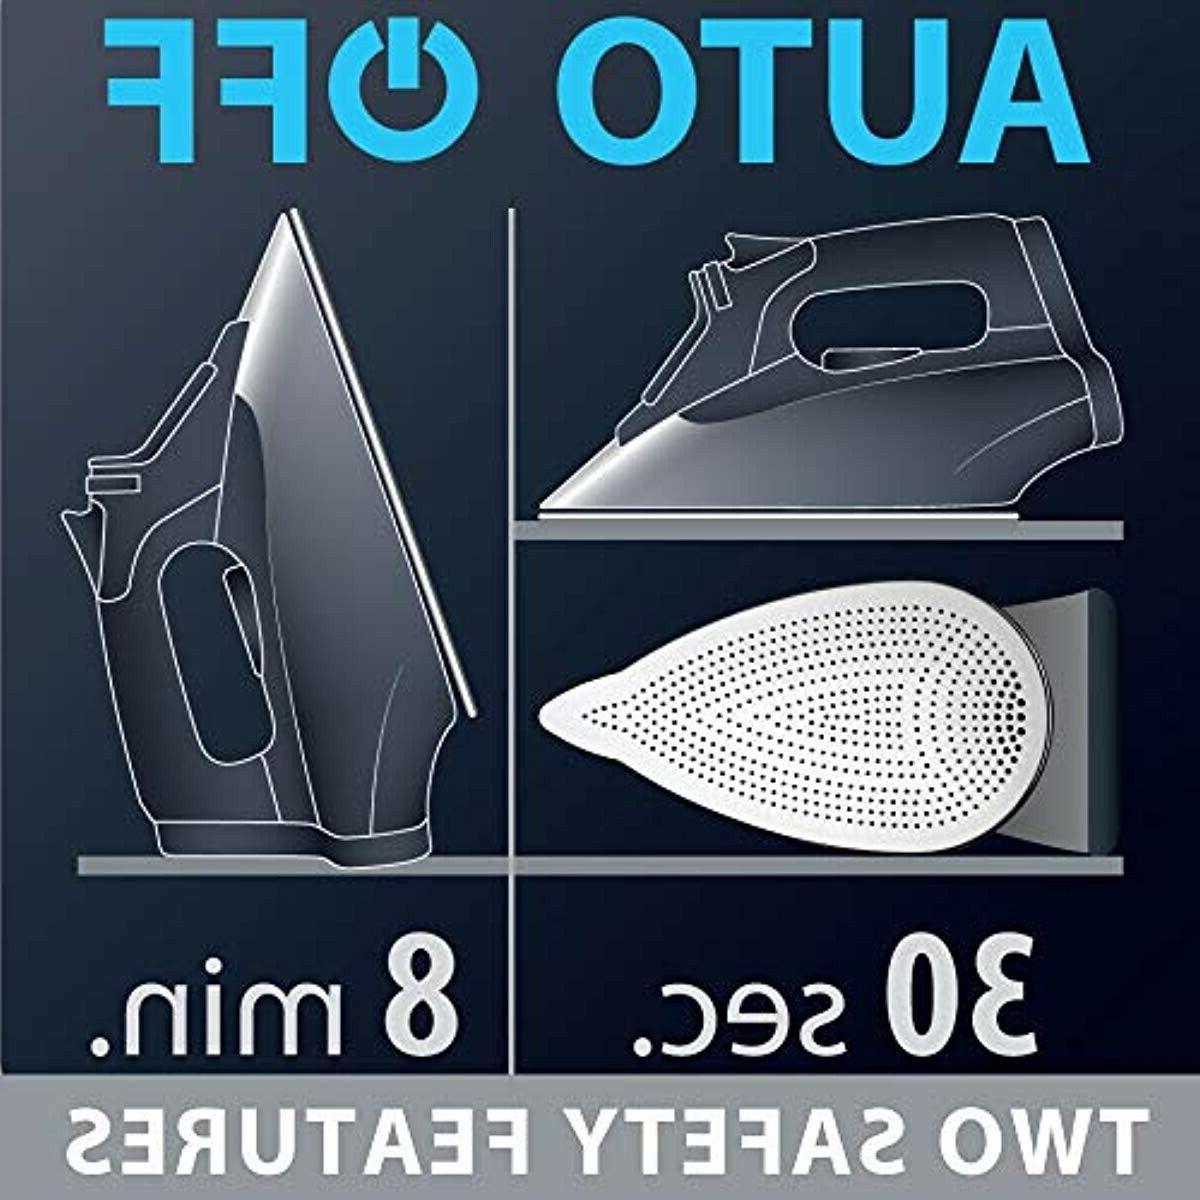 Rowenta 1700-Watt Micro Iron Steel Soleplate with Auto-Off, 400-